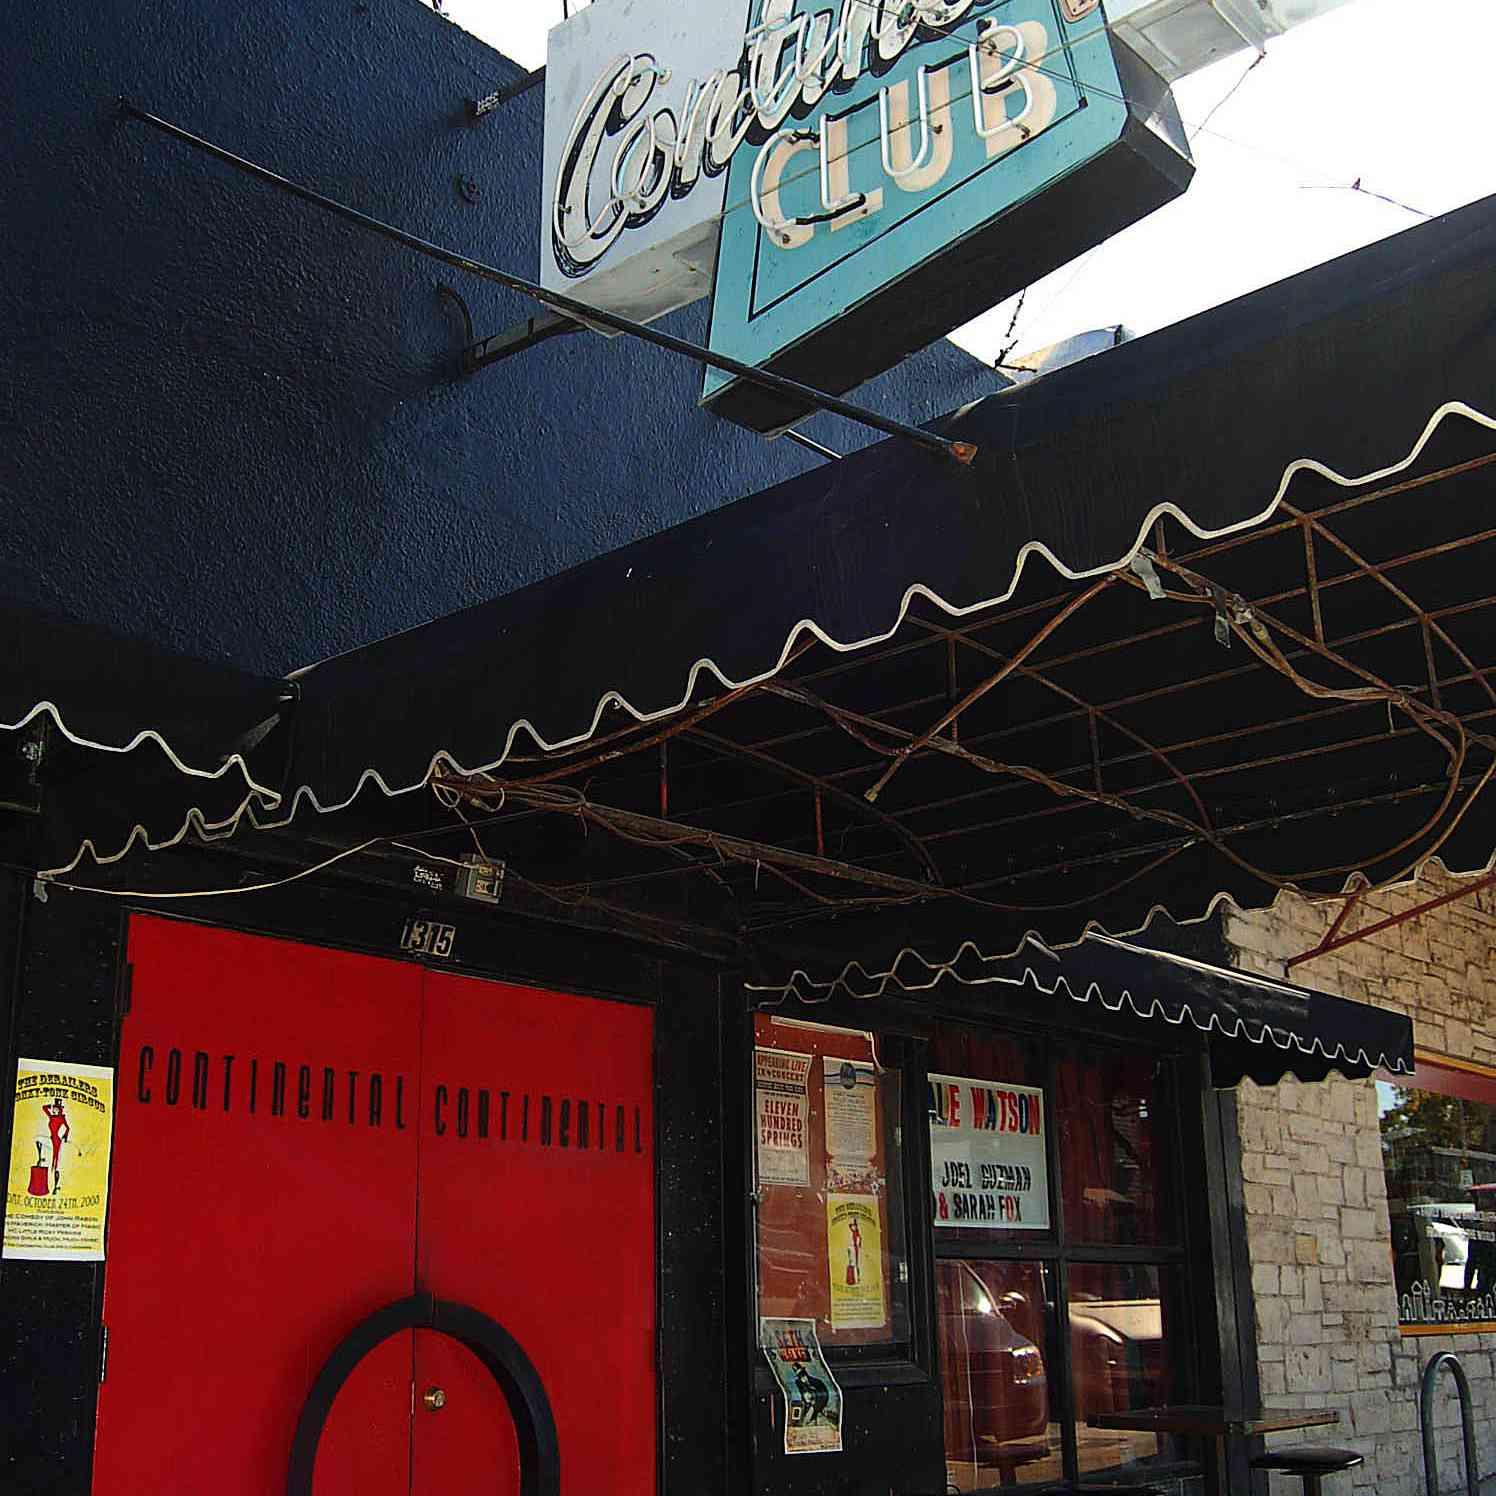 The Continental Club en South Congress Avenue